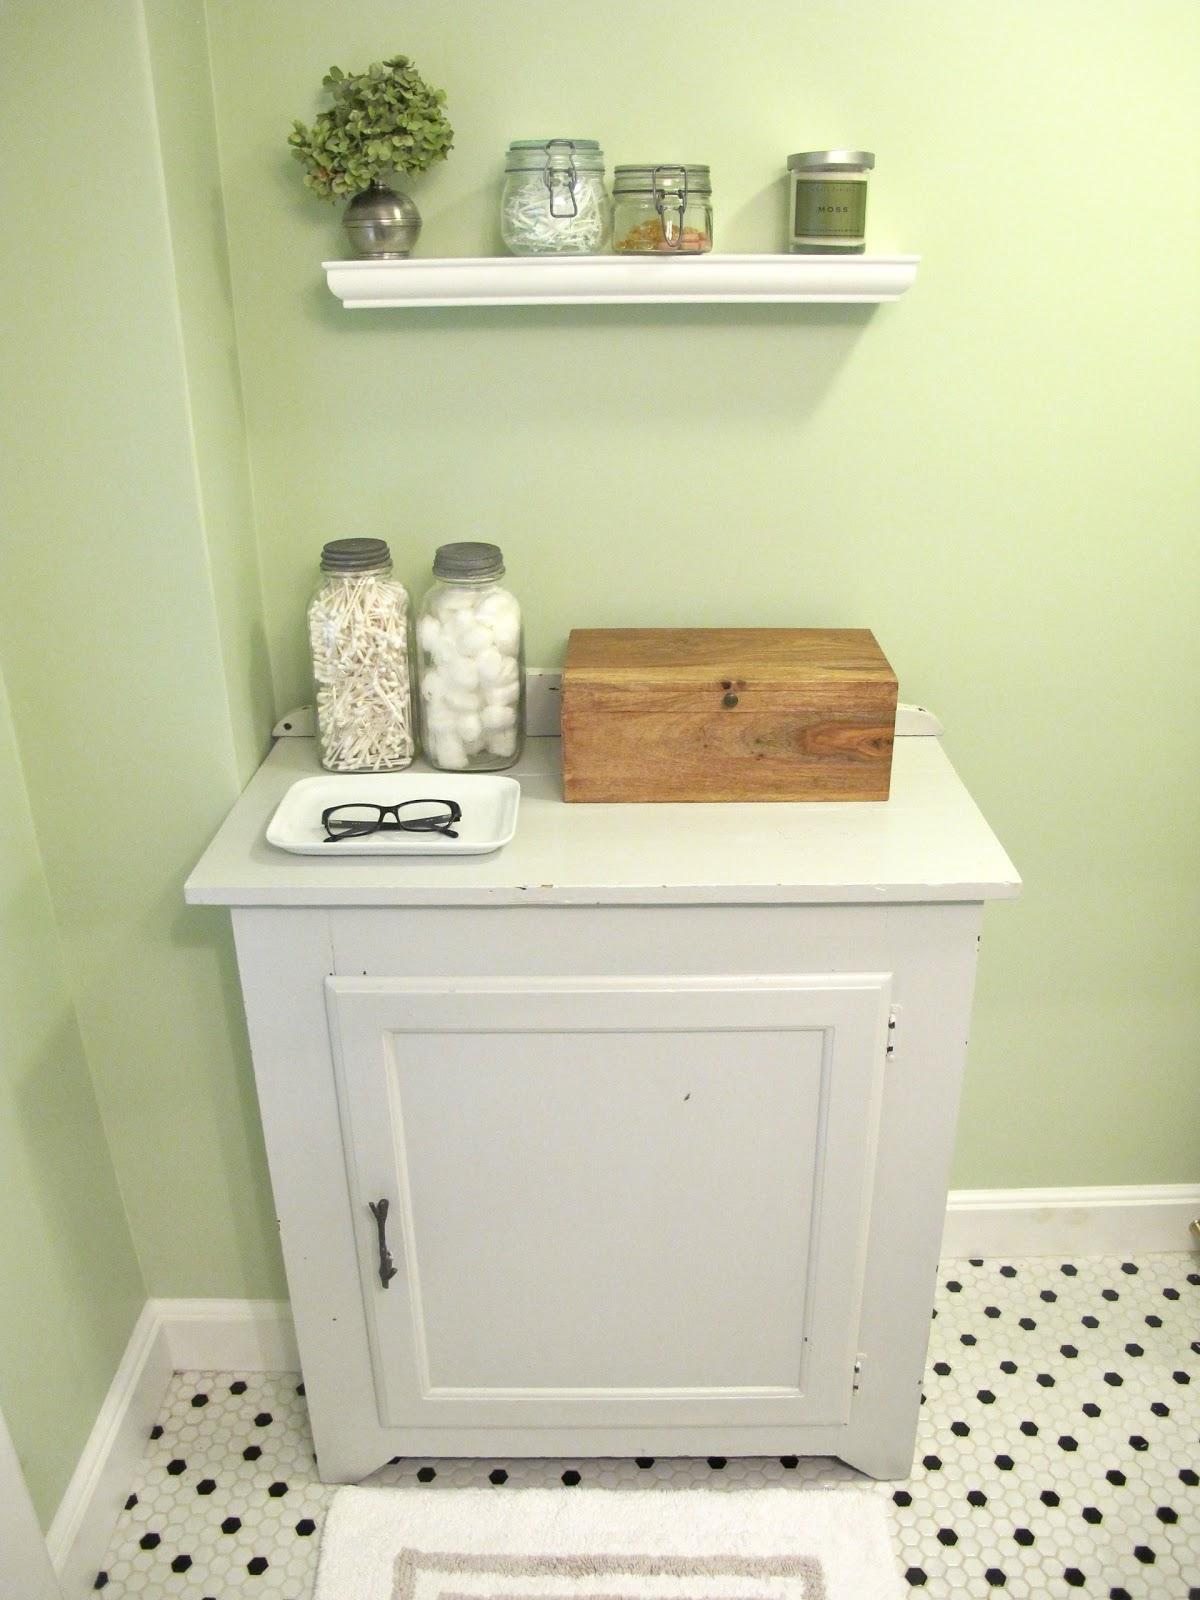 Small Apartment Balcony Garden Ideas: Jenny Steffens Hobick: Bathroom Redo